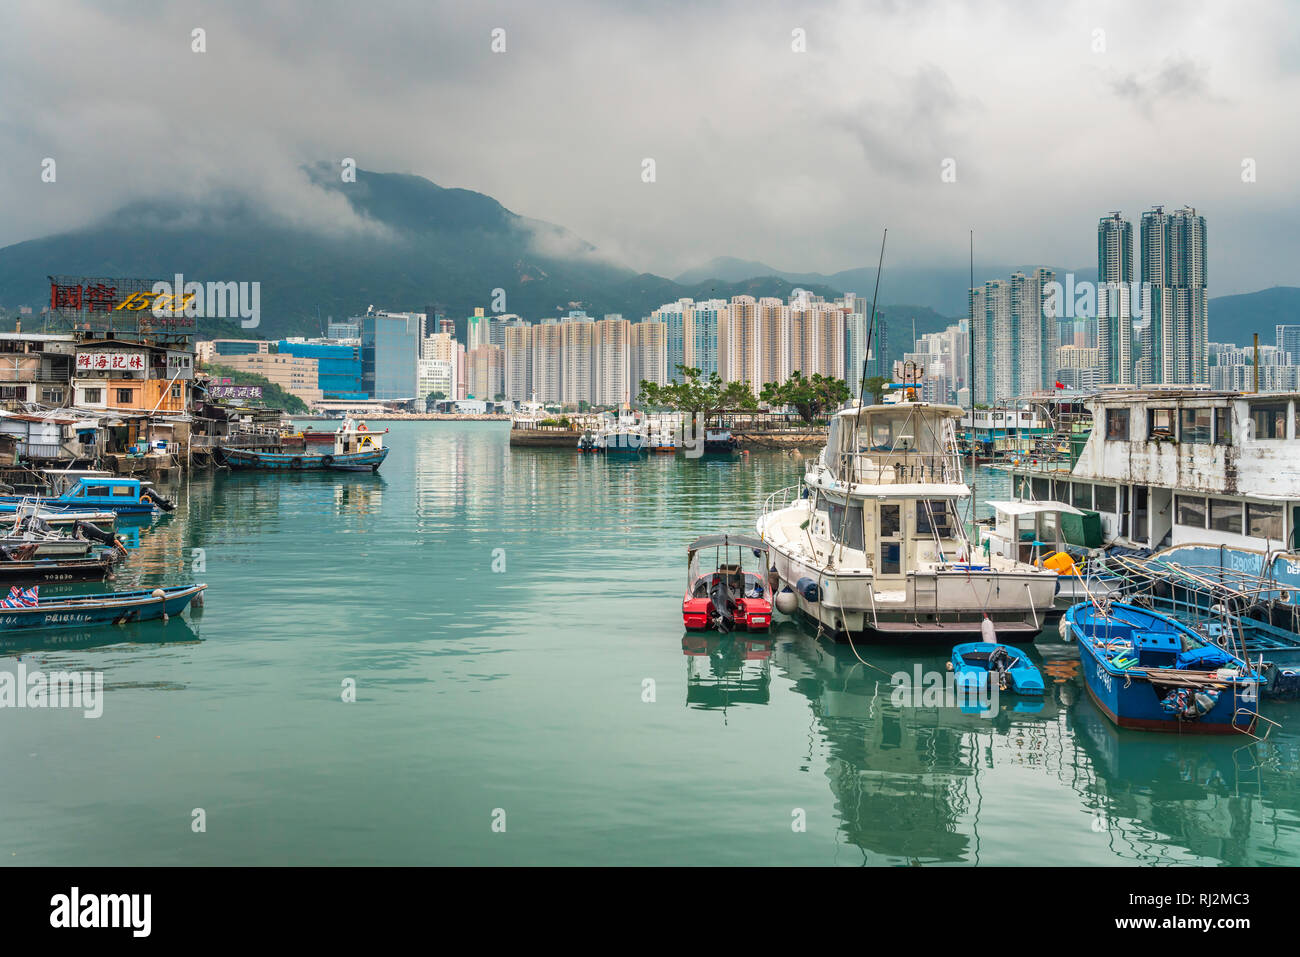 The fishing village of Lei Yu Mun in Kowloon, Hong Kong, China, Asia. - Stock Image